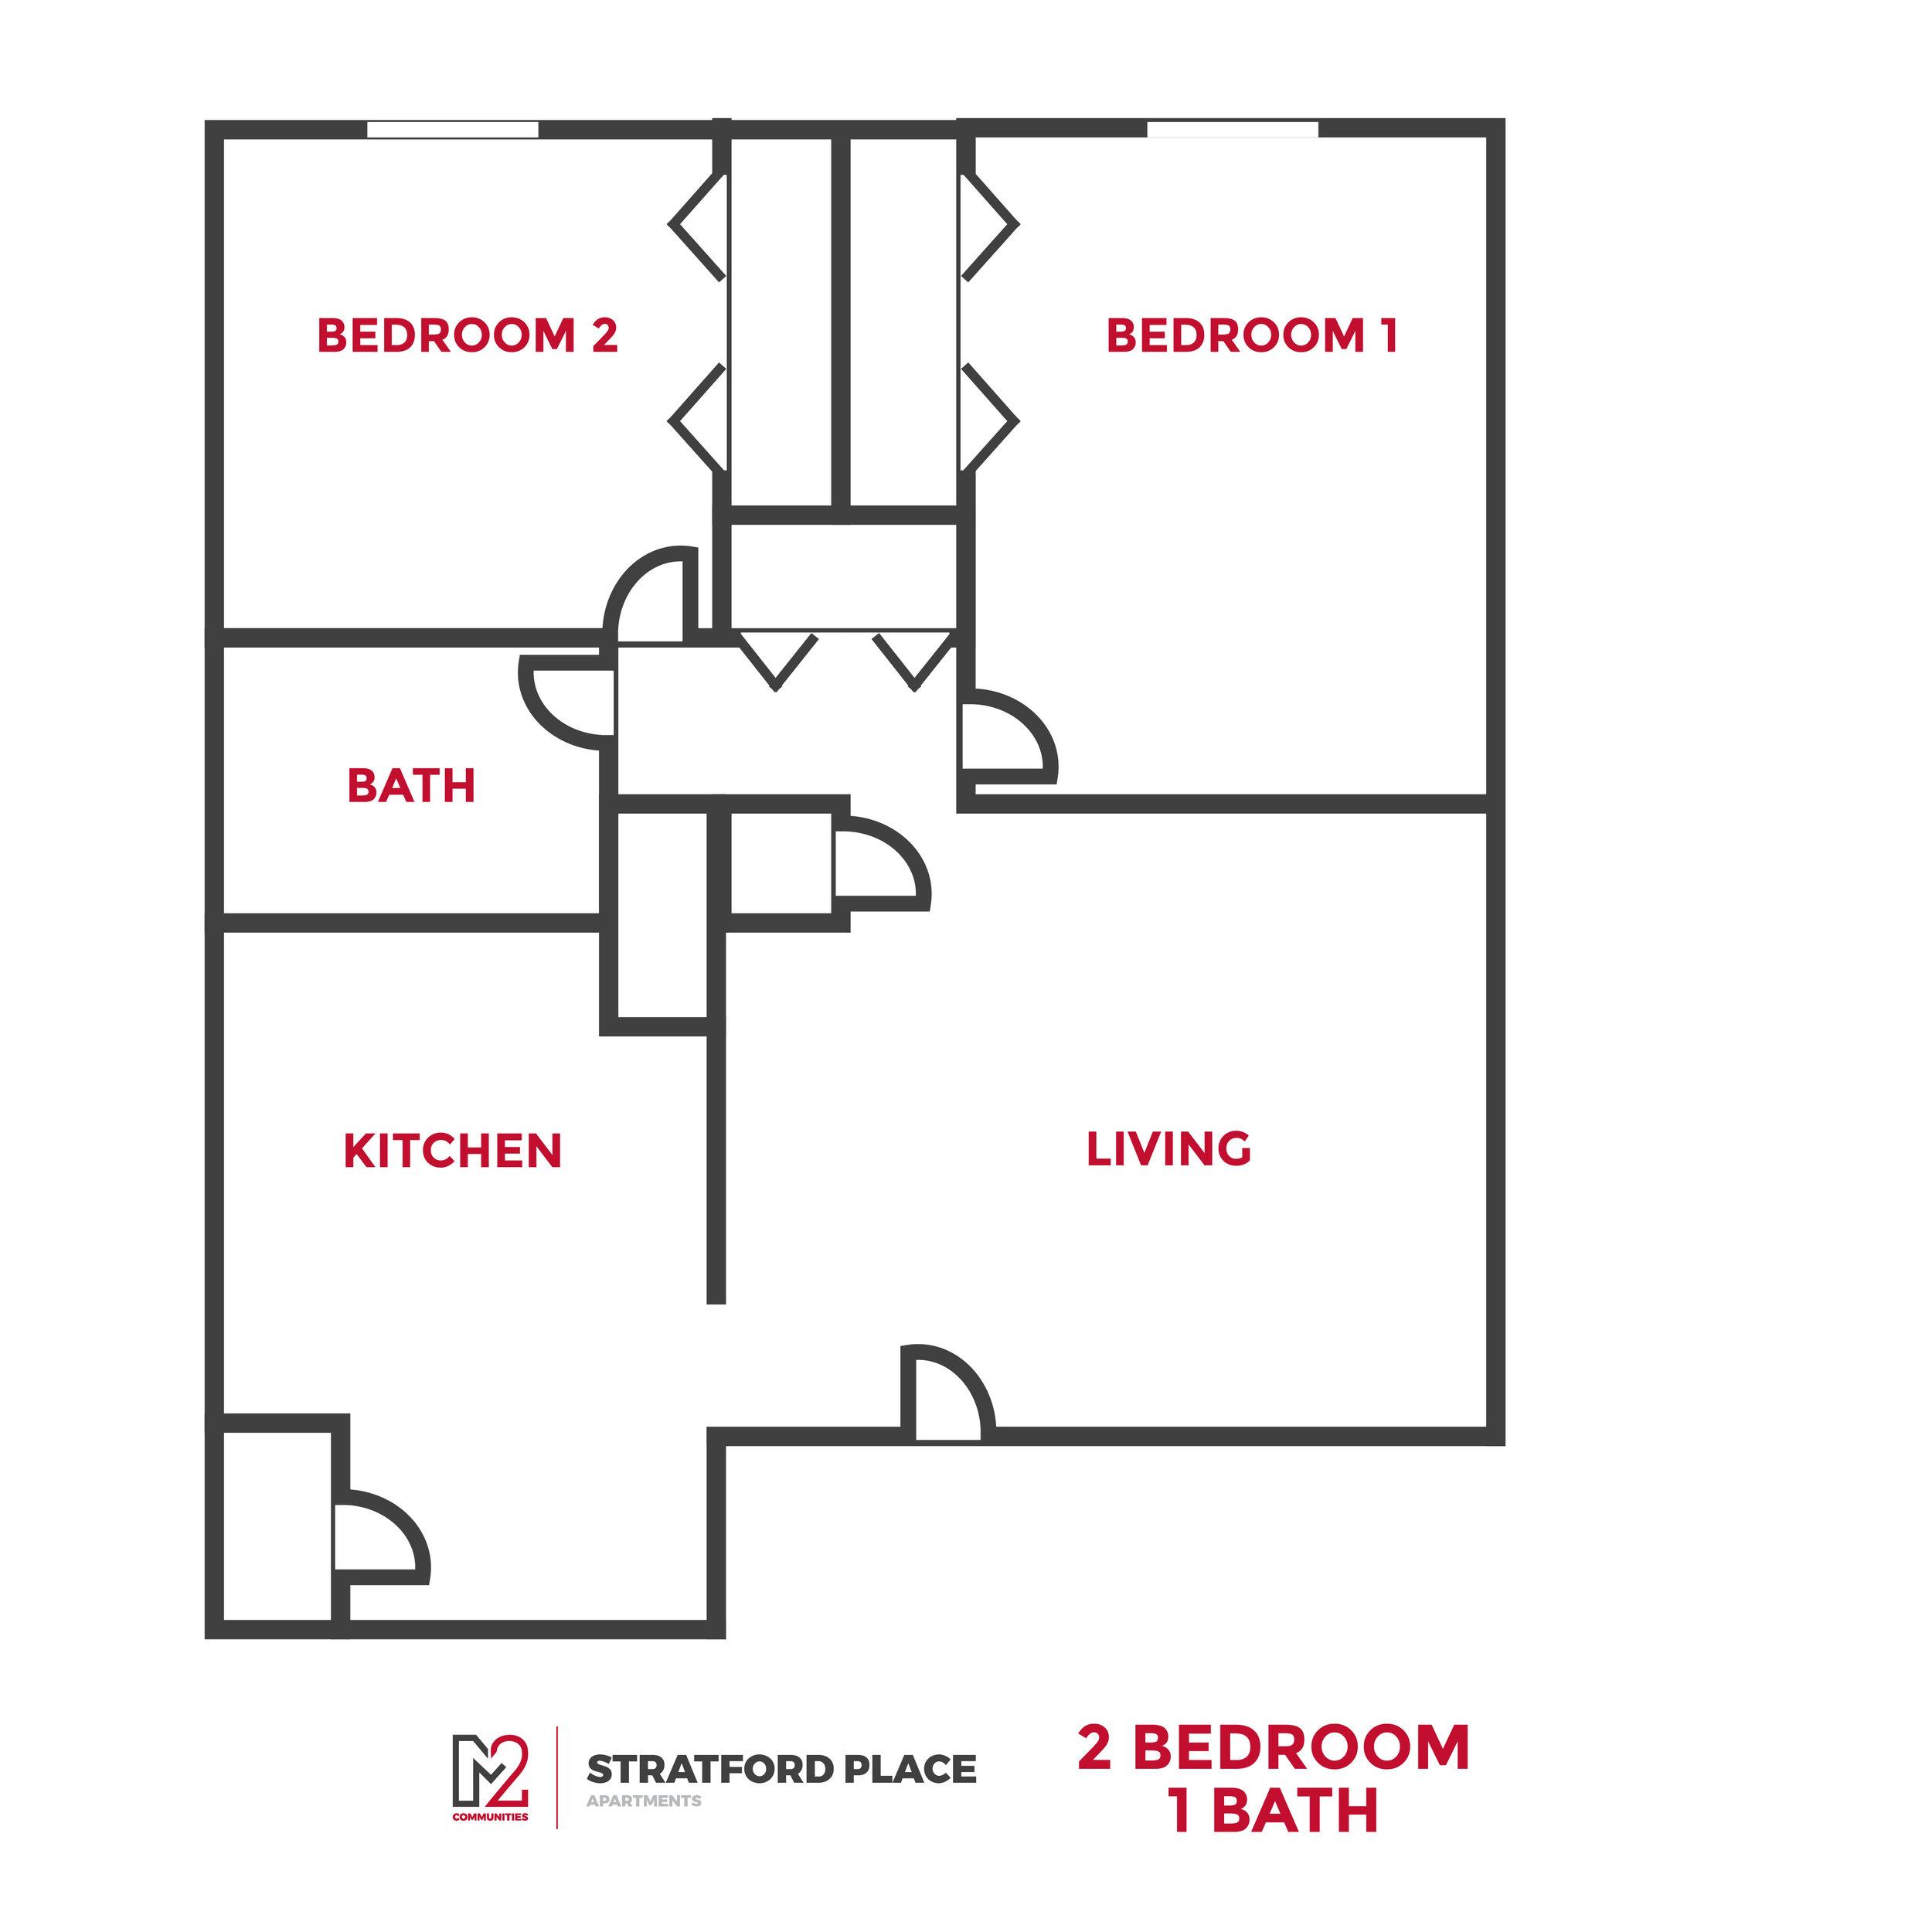 M2_Stratford_Floorplans-16.jpg